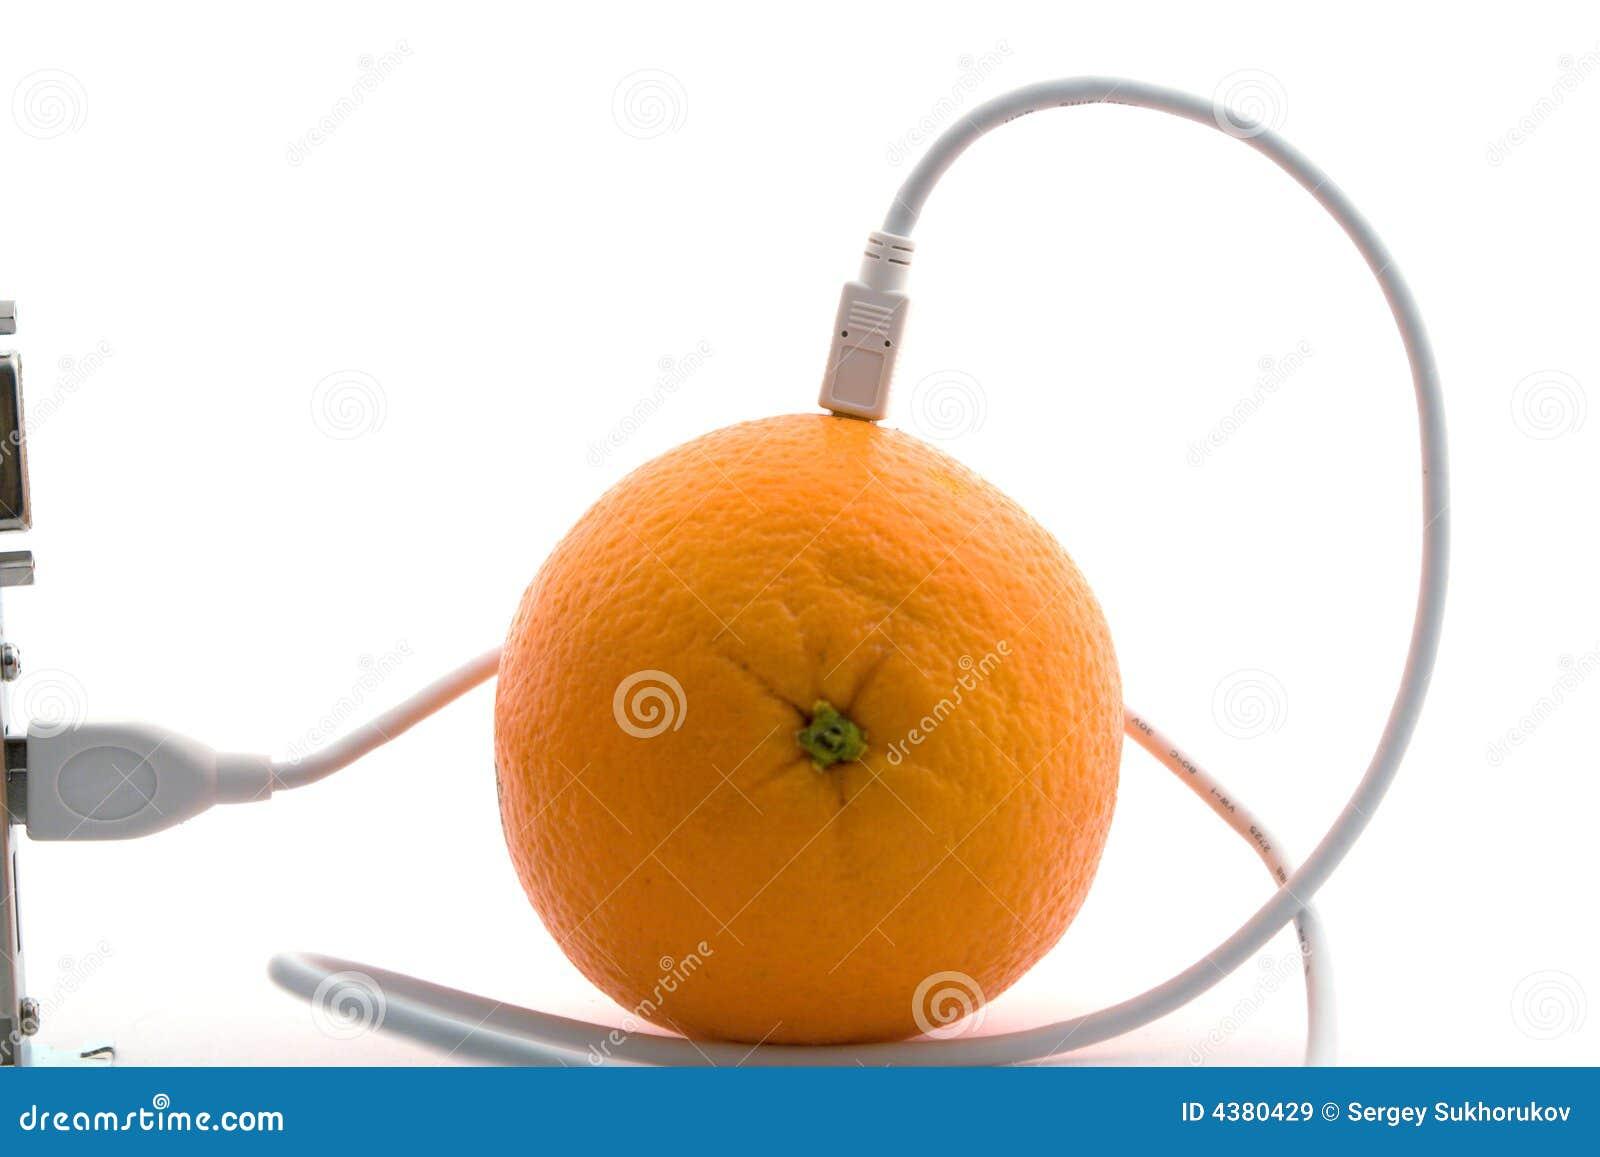 A laranja conectada através do cabo